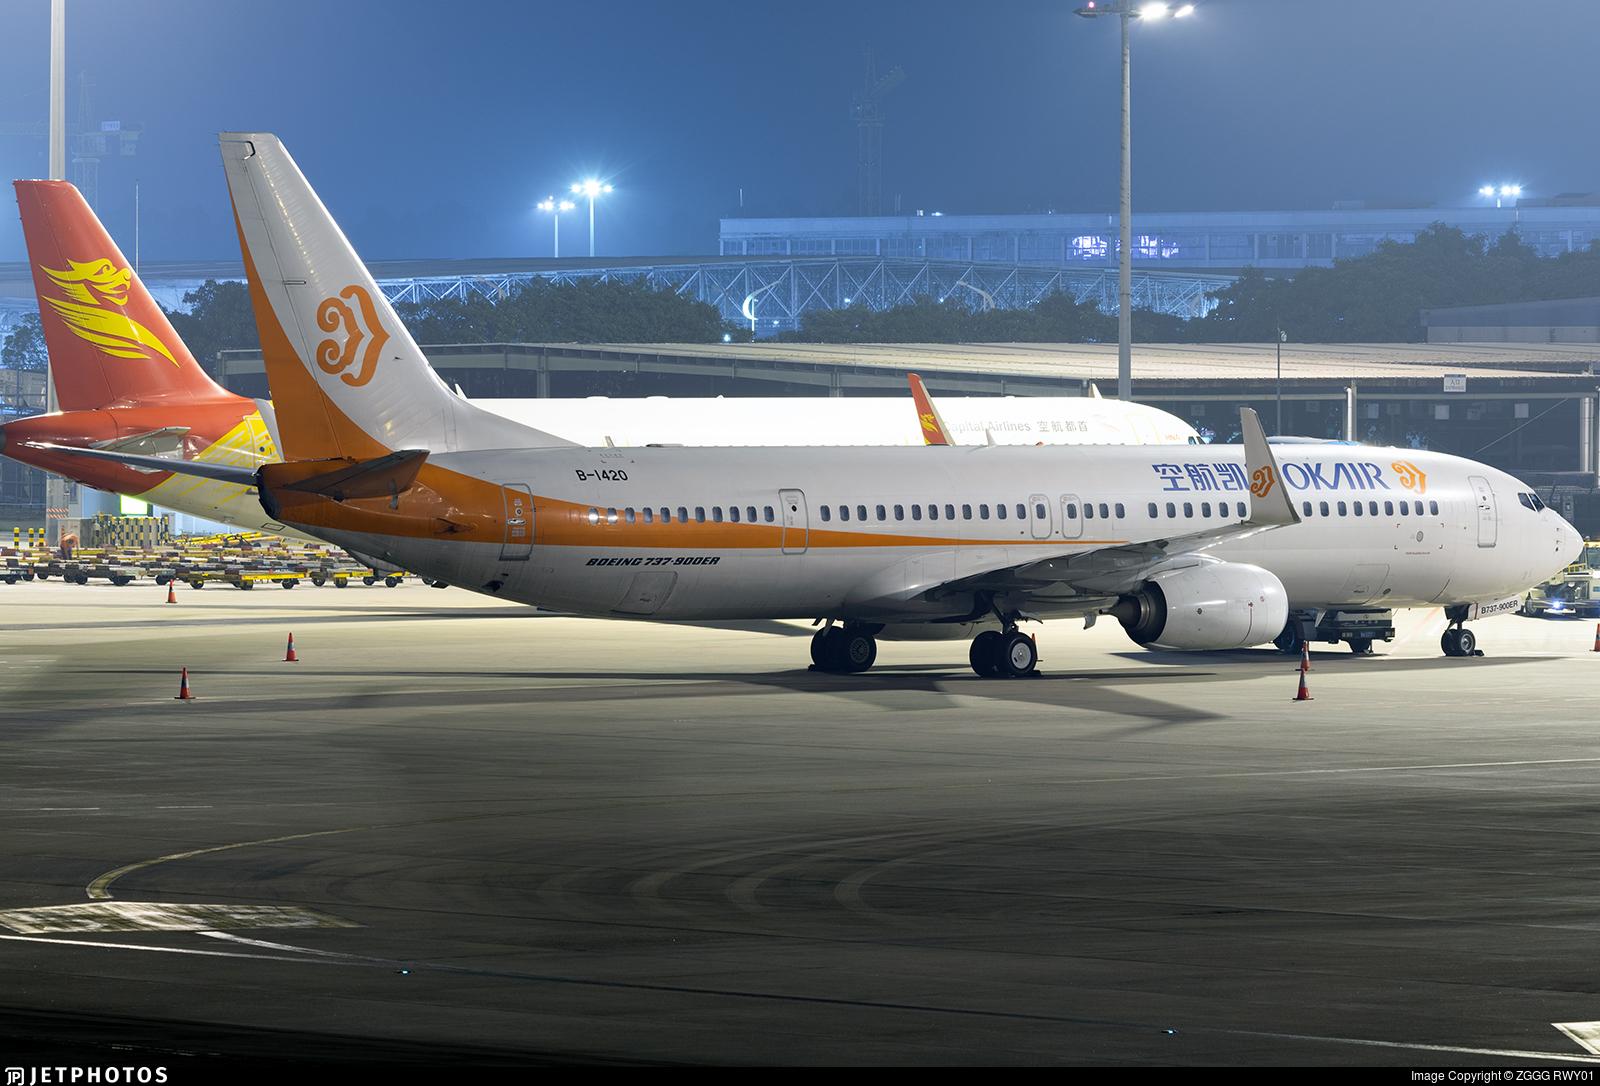 B-1420 | Boeing 737-9KFER | OK Air | ZGGG RWY01 | JetPhotos